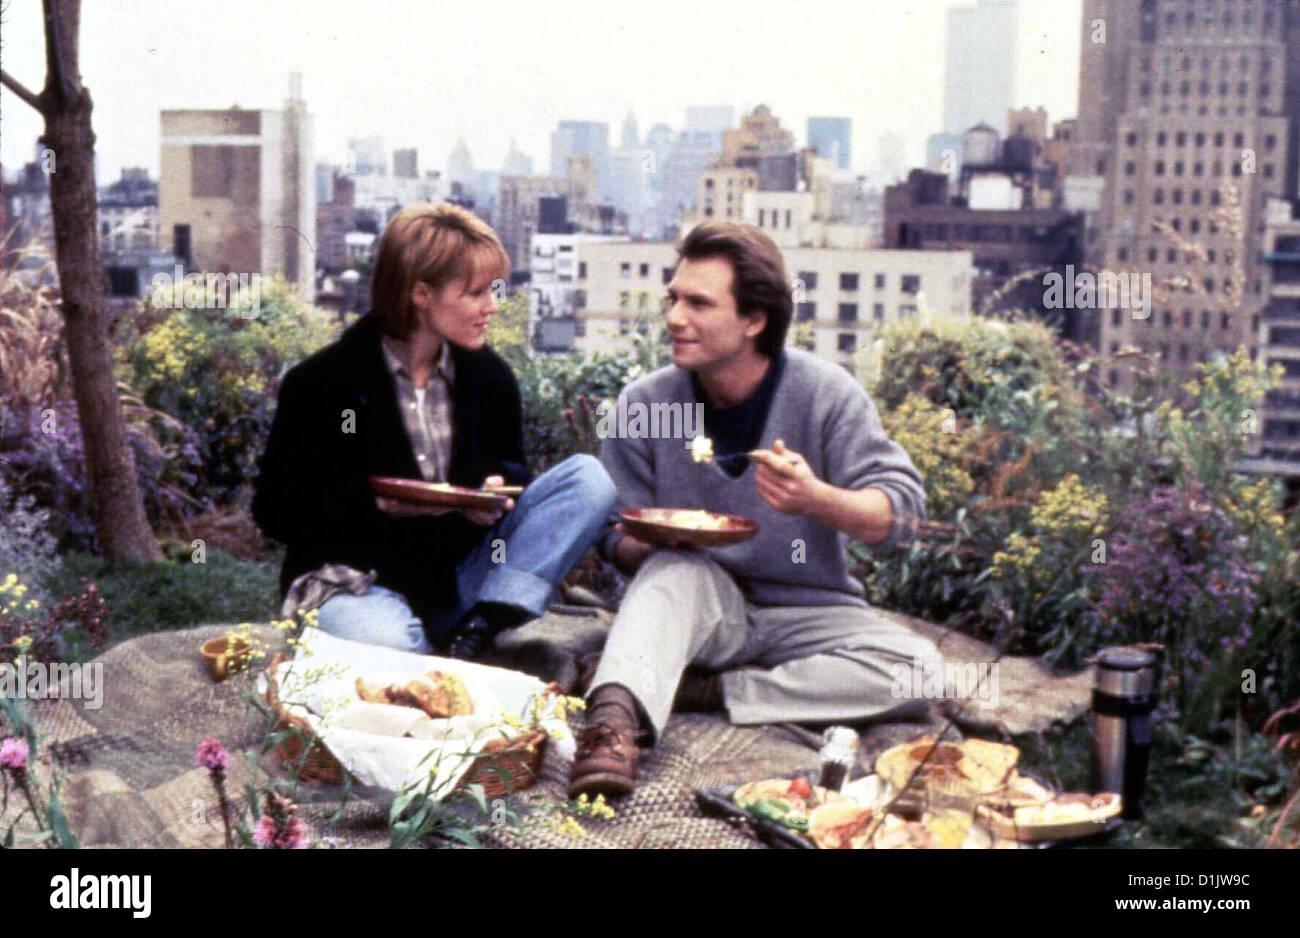 Das Rosenbett  Bed Roses  Mary Stuart Masterson, Christian Slater Nach langem Zögern beginnt die kuehle Geschaeftsfrau Stock Photo